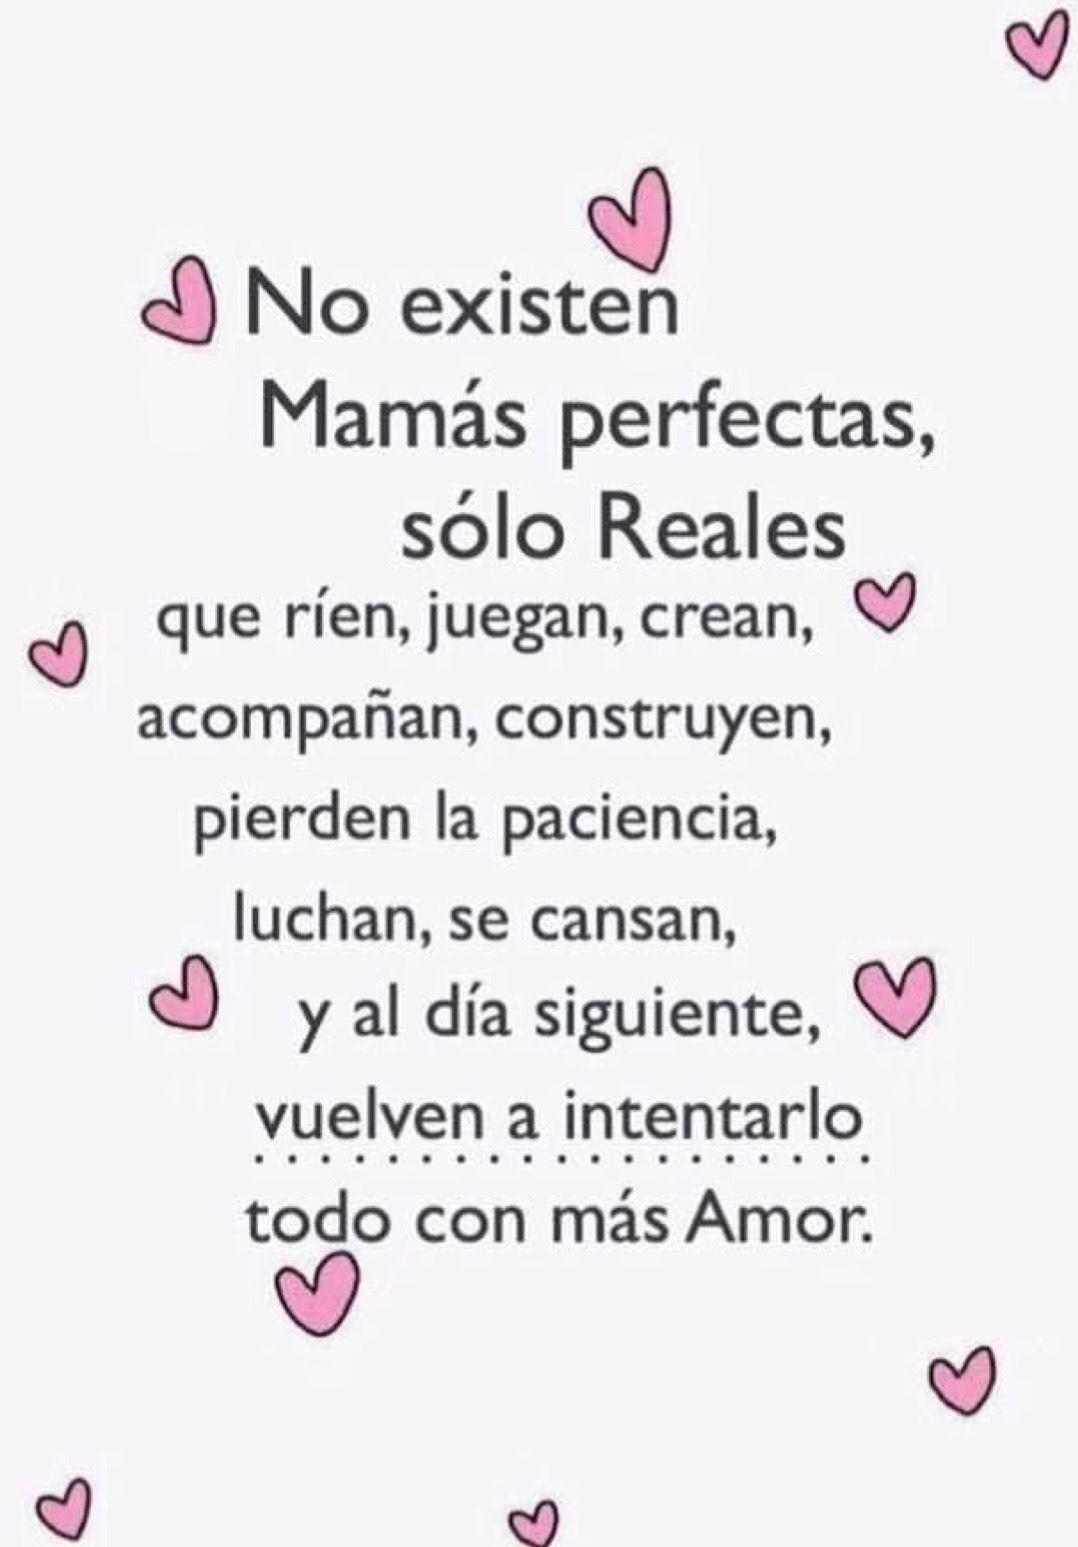 Pin de Mami Querida en Pensamientos   Frases bonitas, Frases bonitas para  mama, Te amo mamá frases